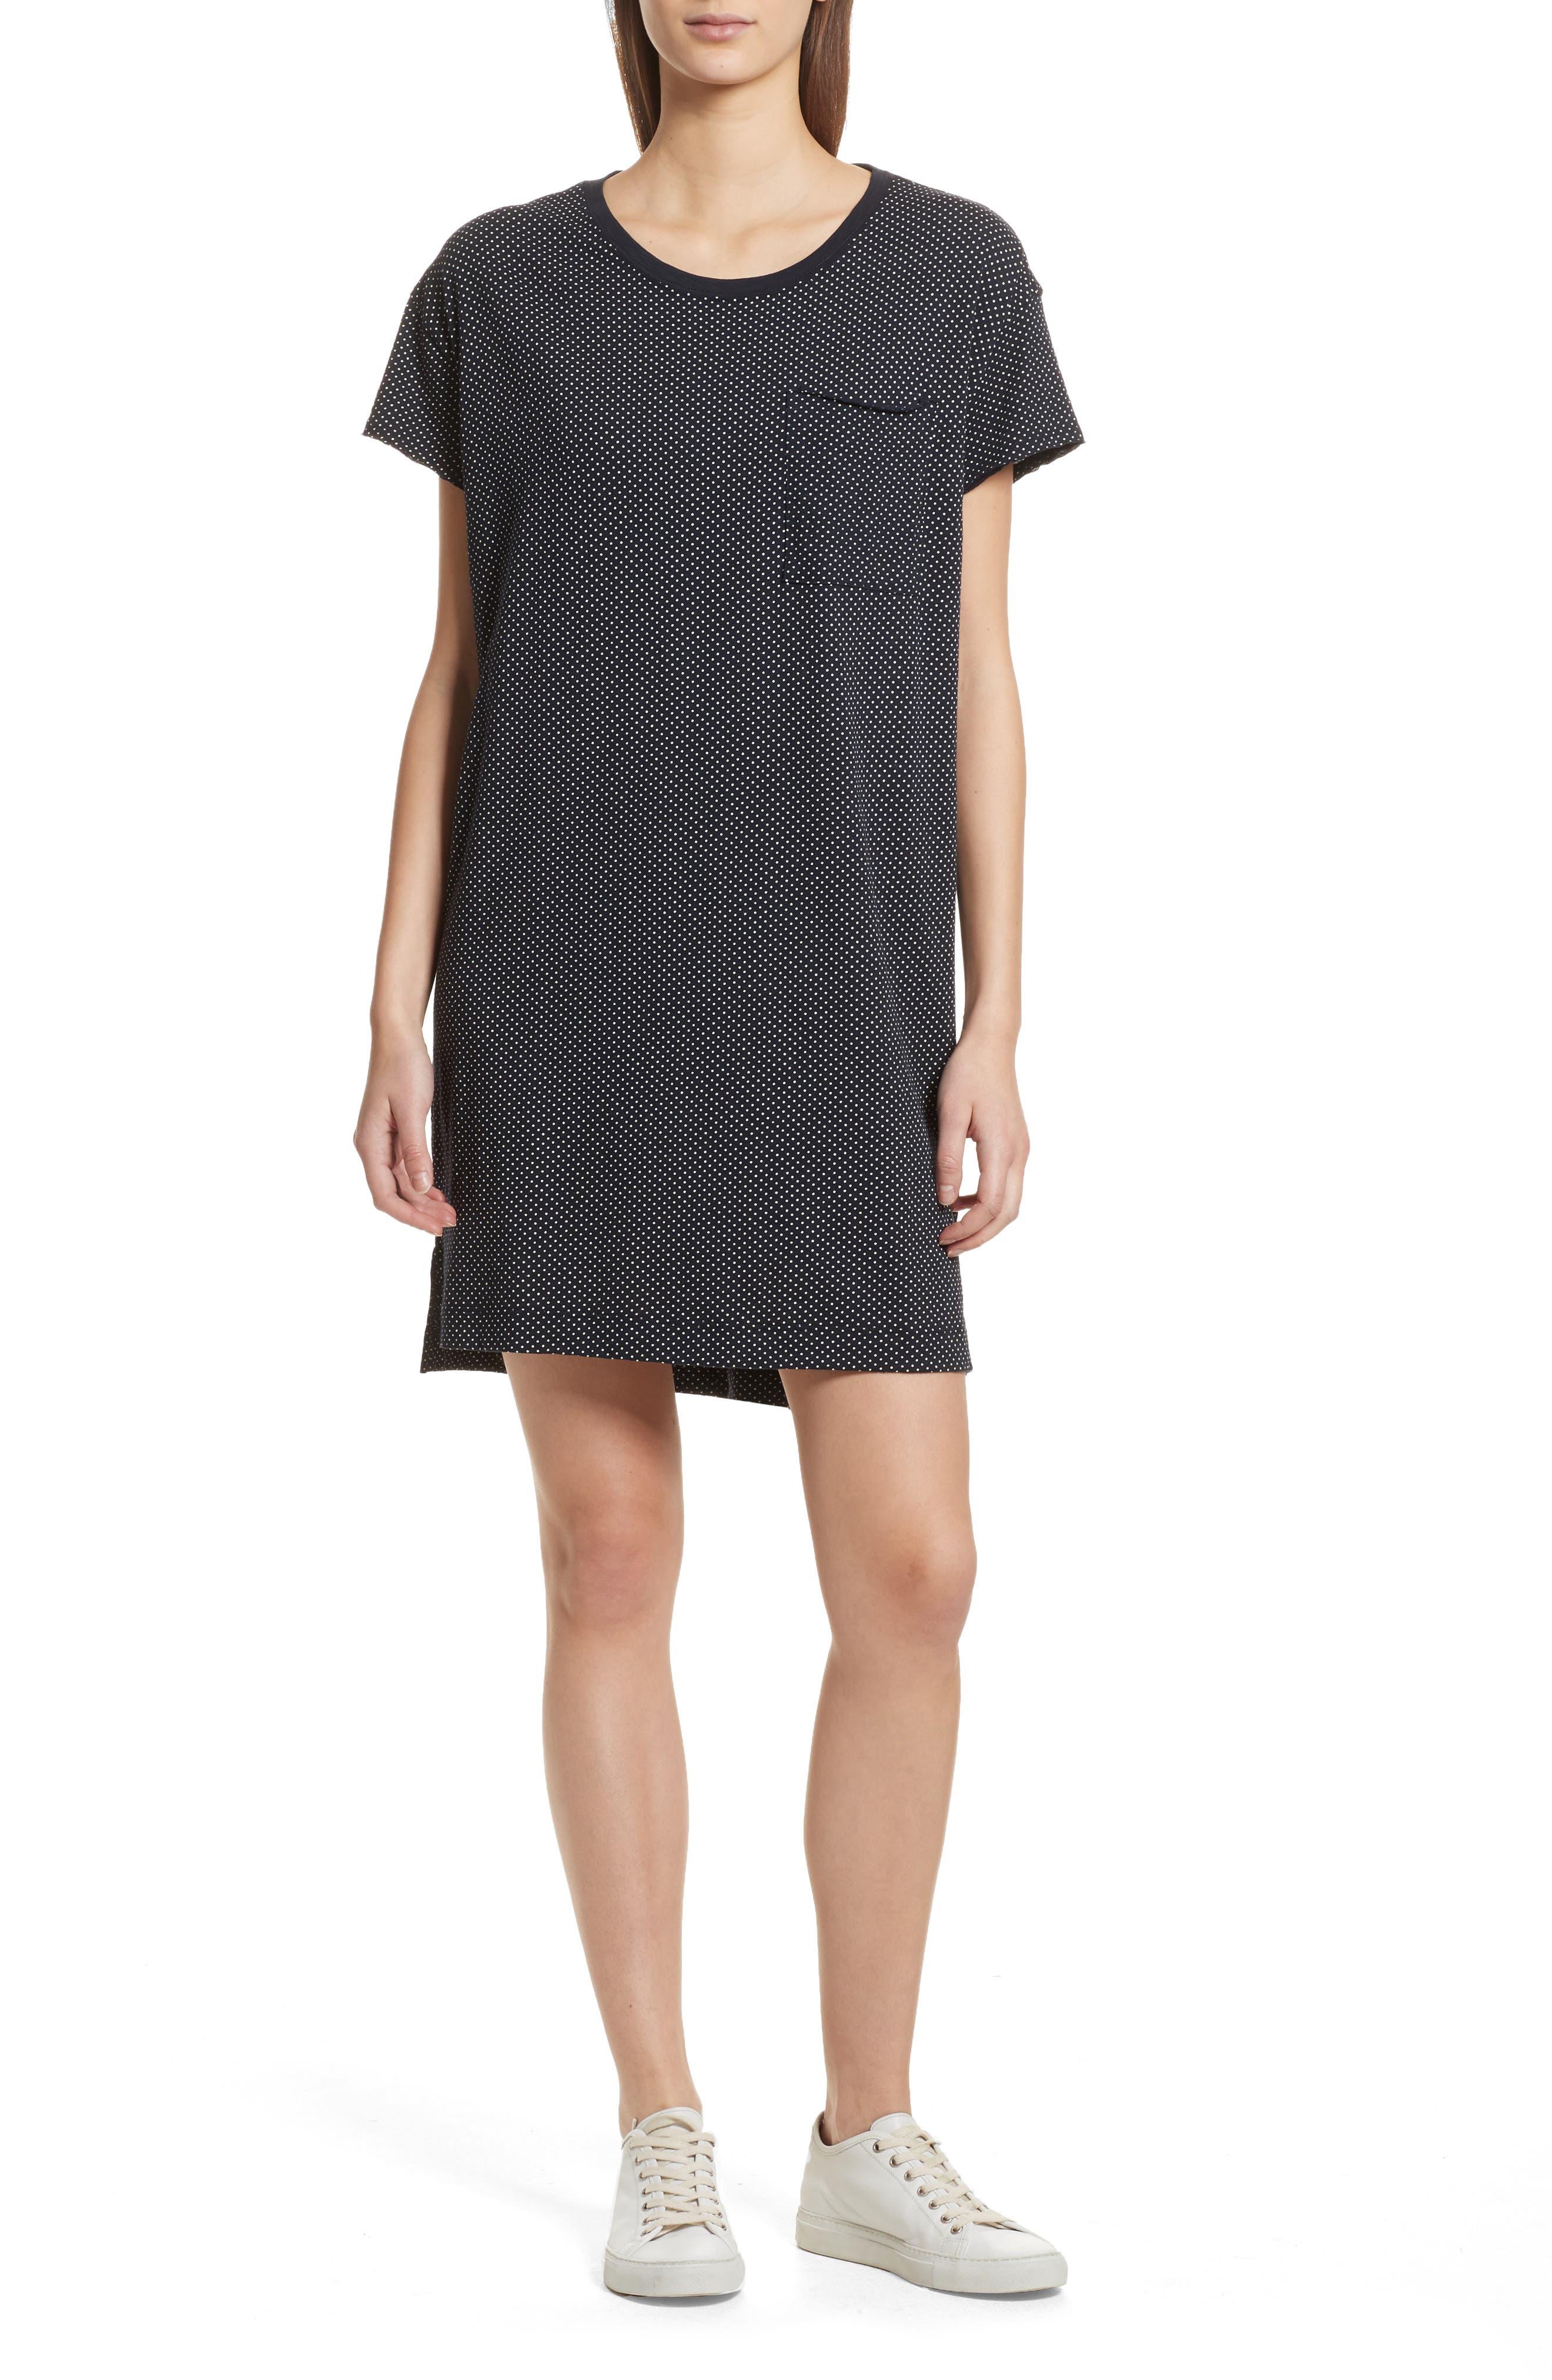 ATM Anthony Thomas Melillo Polka Dot T-Shirt Dress